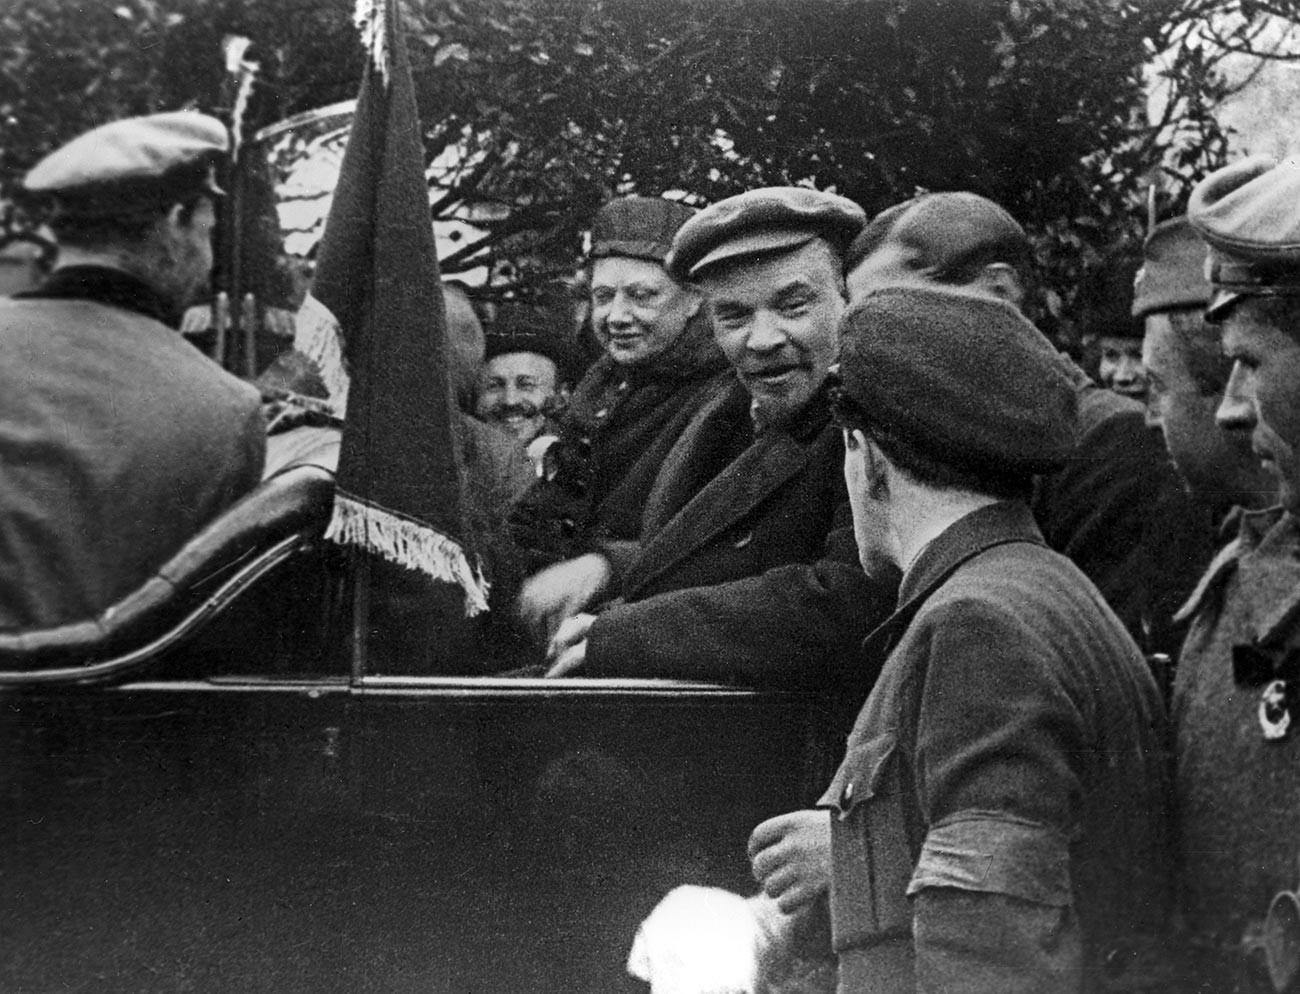 Vladimir Iljič Lenjin i Nadežda Konstantinovna Krupska u automobilu na Crvenom trgu, 1. svibnja 1919.